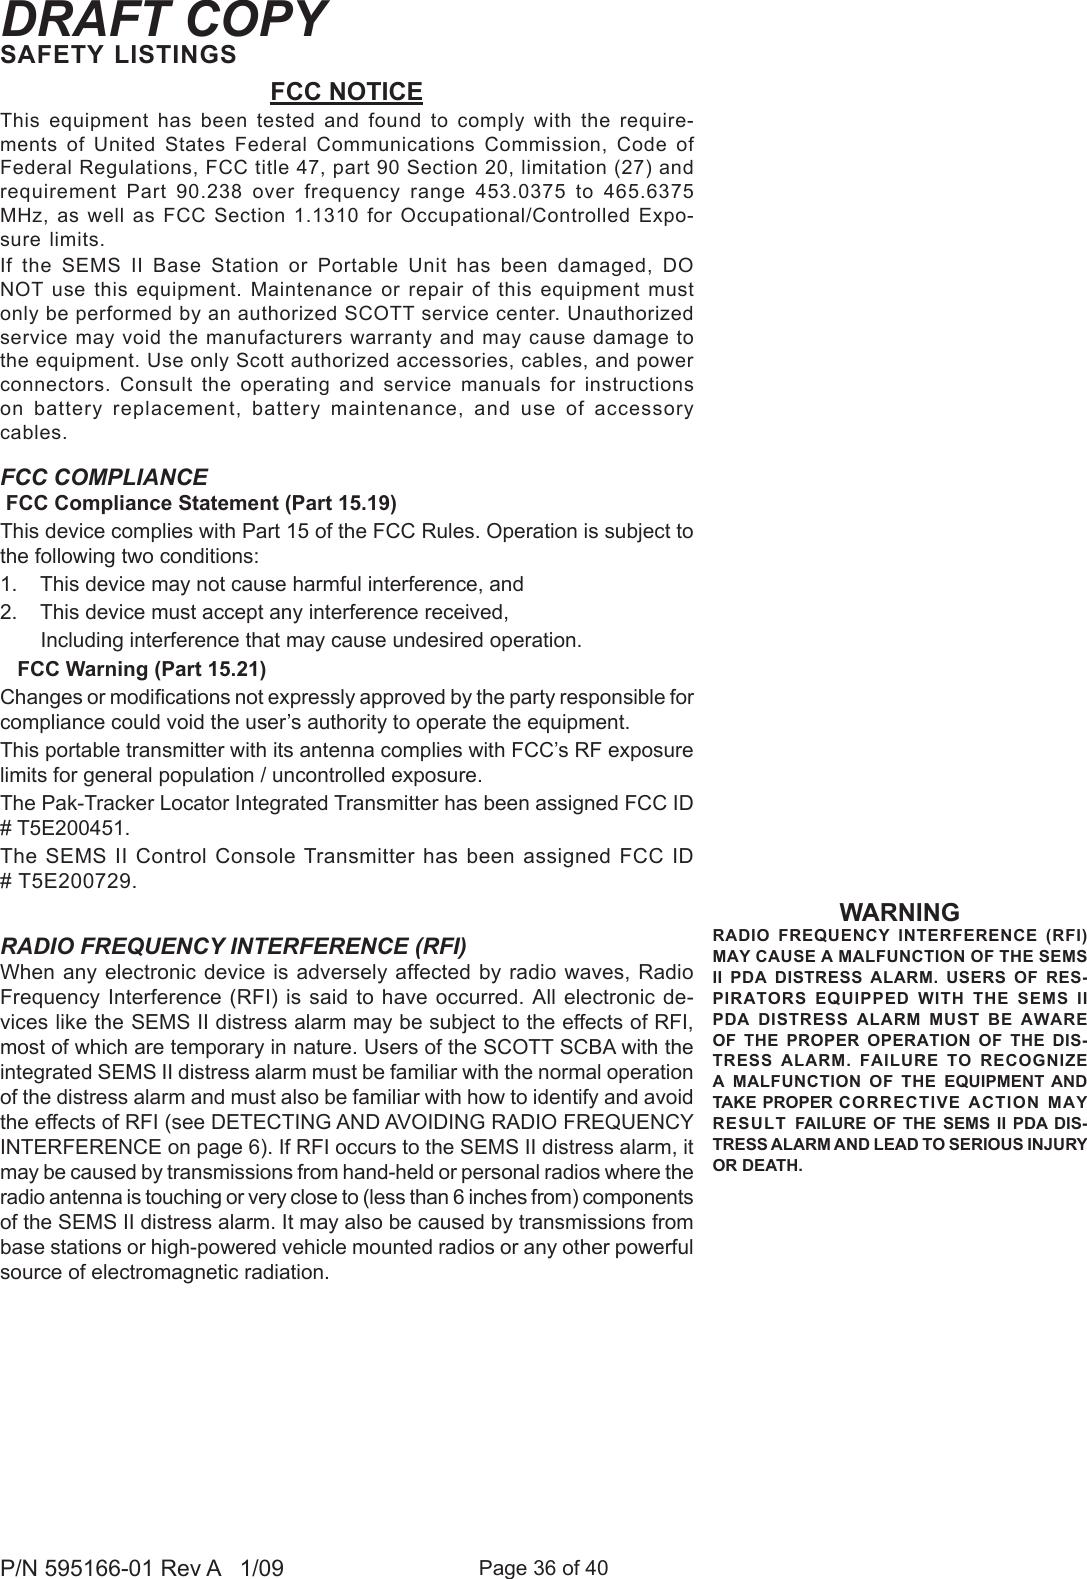 scott pak tracker user instructions